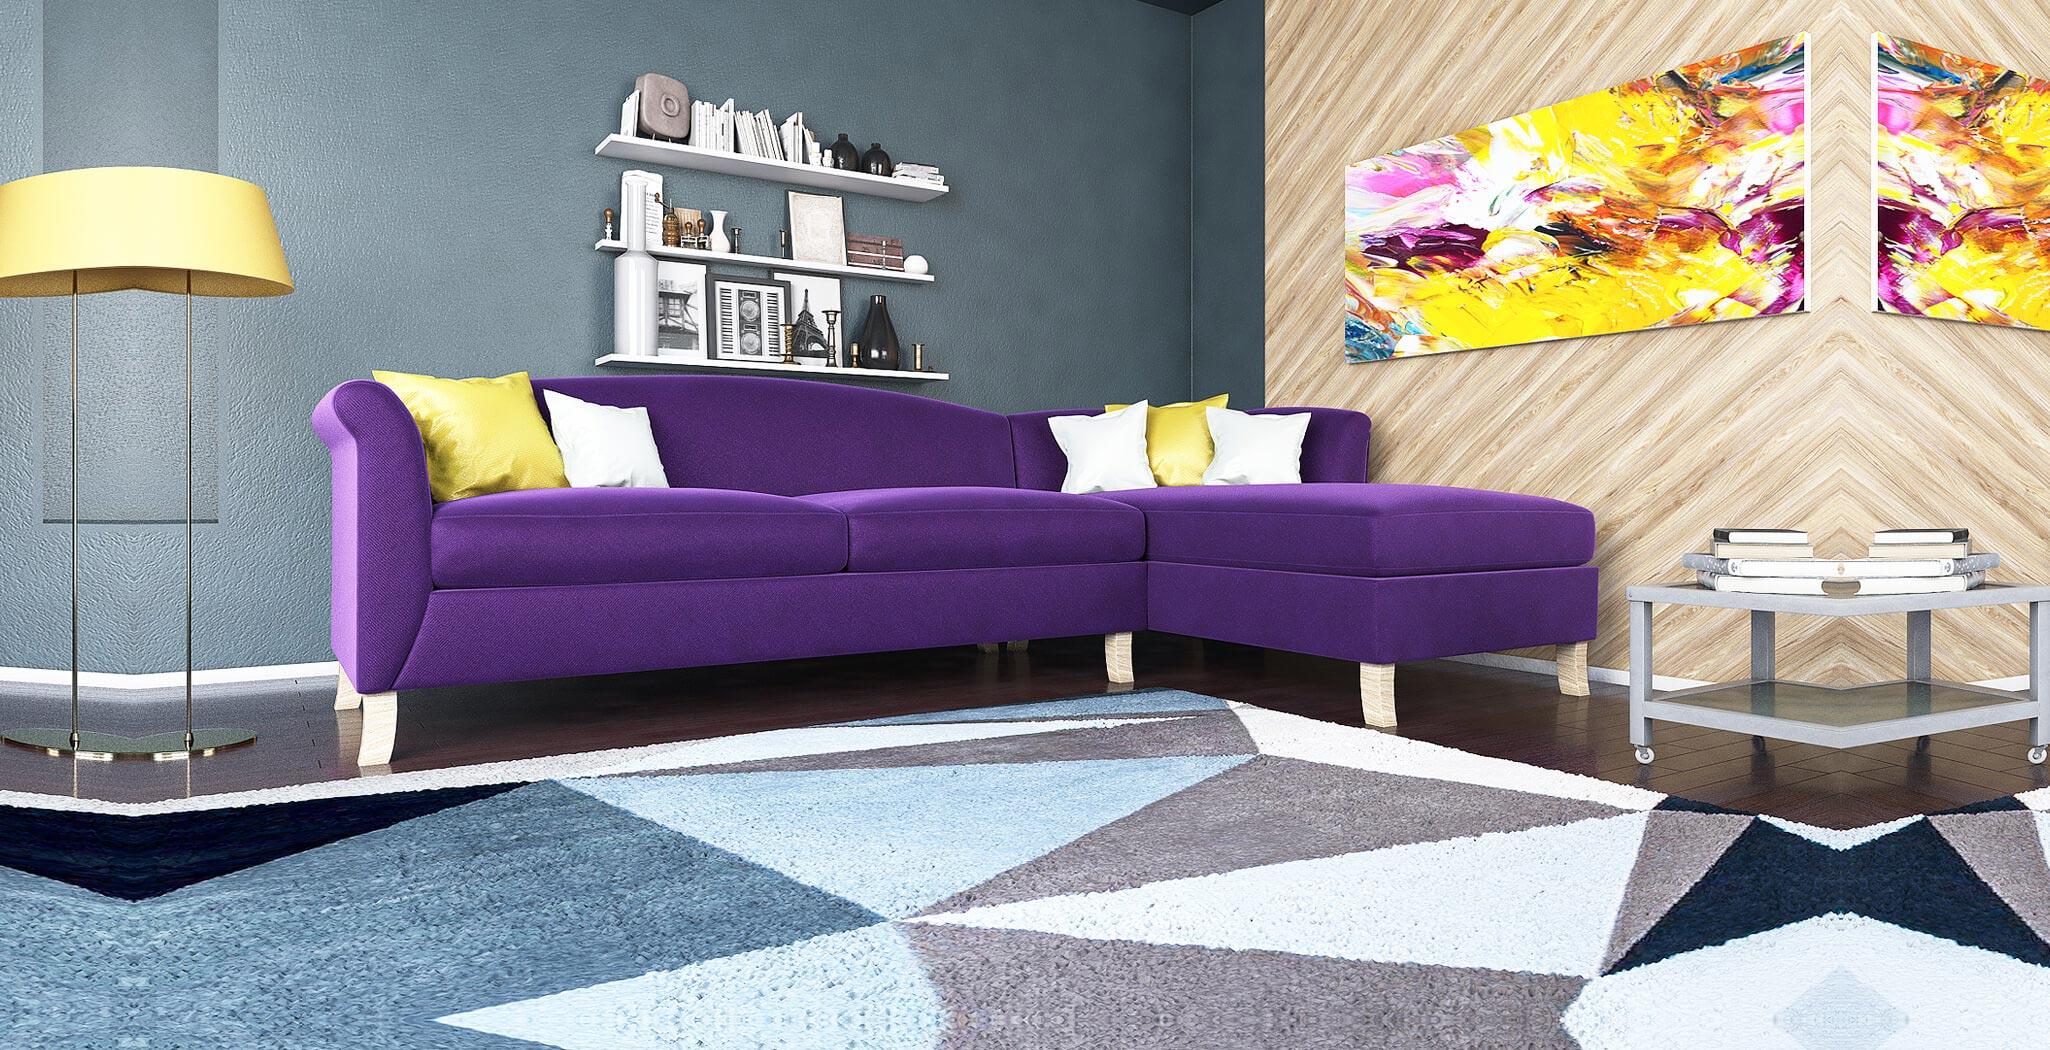 crete panel furniture gallery 4